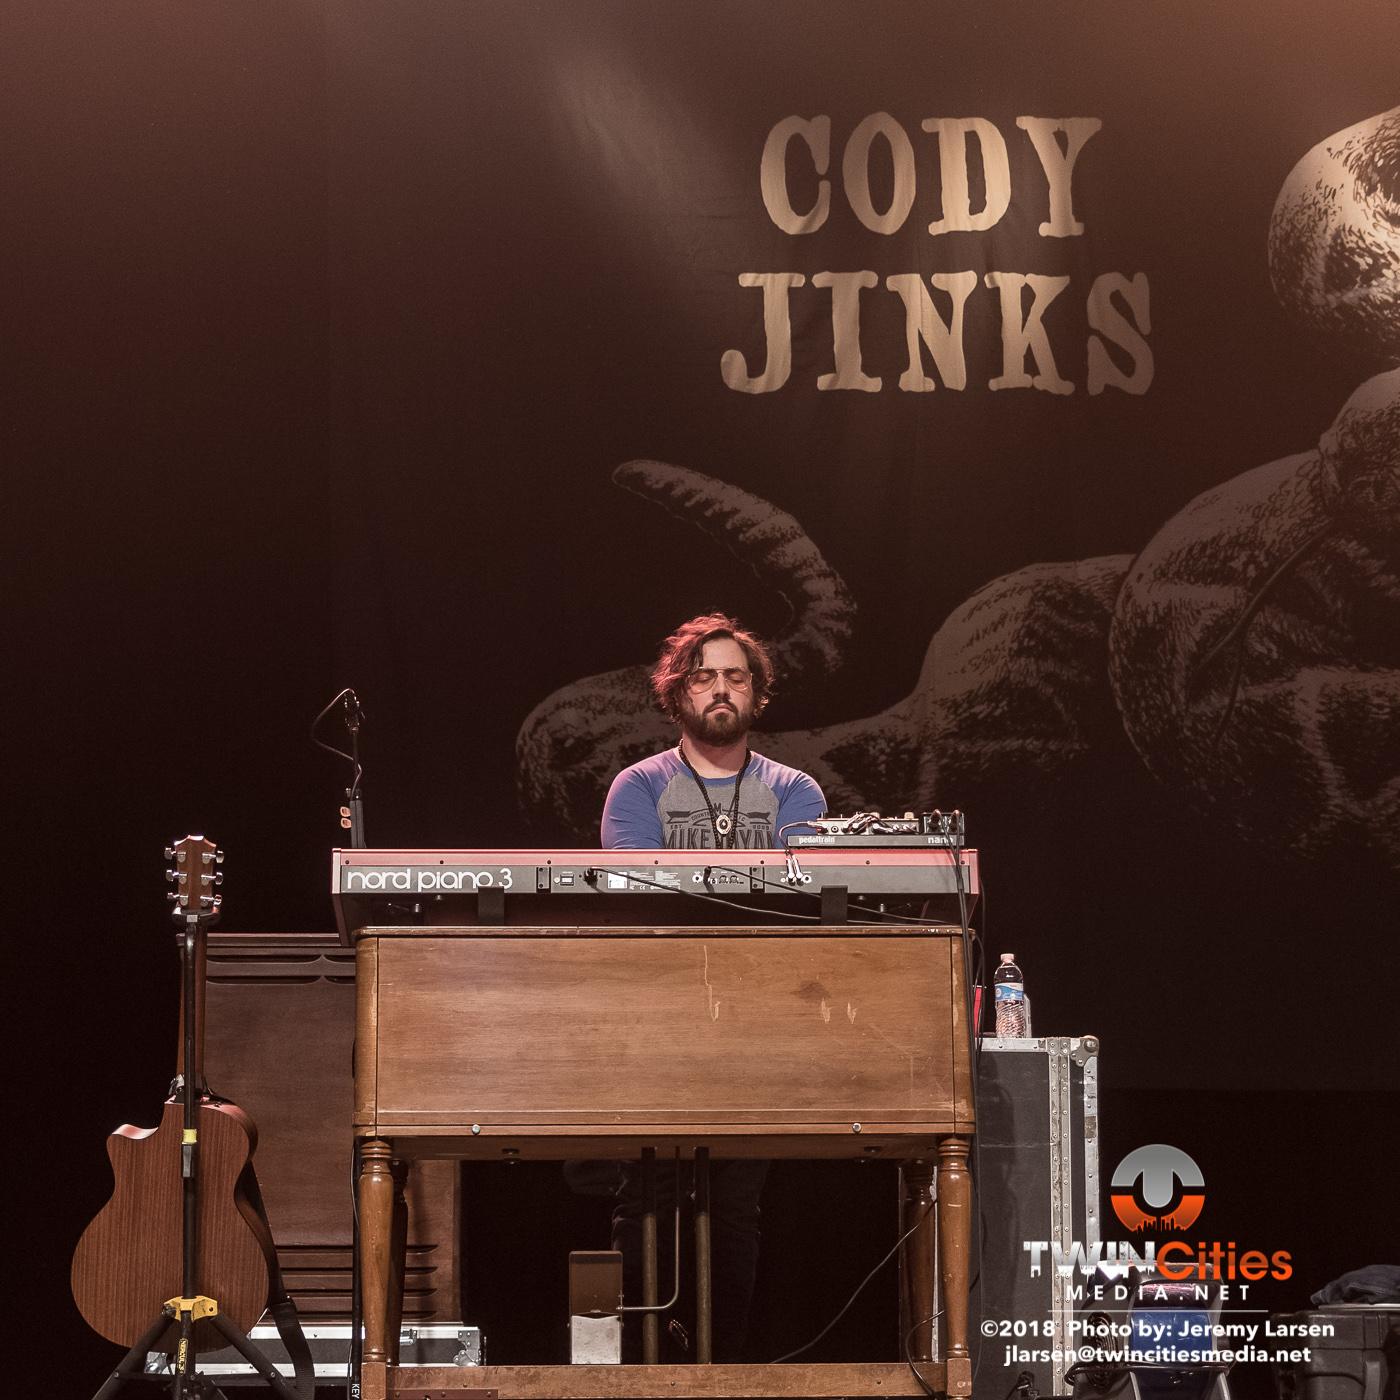 Cody-Jinks-Verizon-Grand-Hall-3-22-19-2